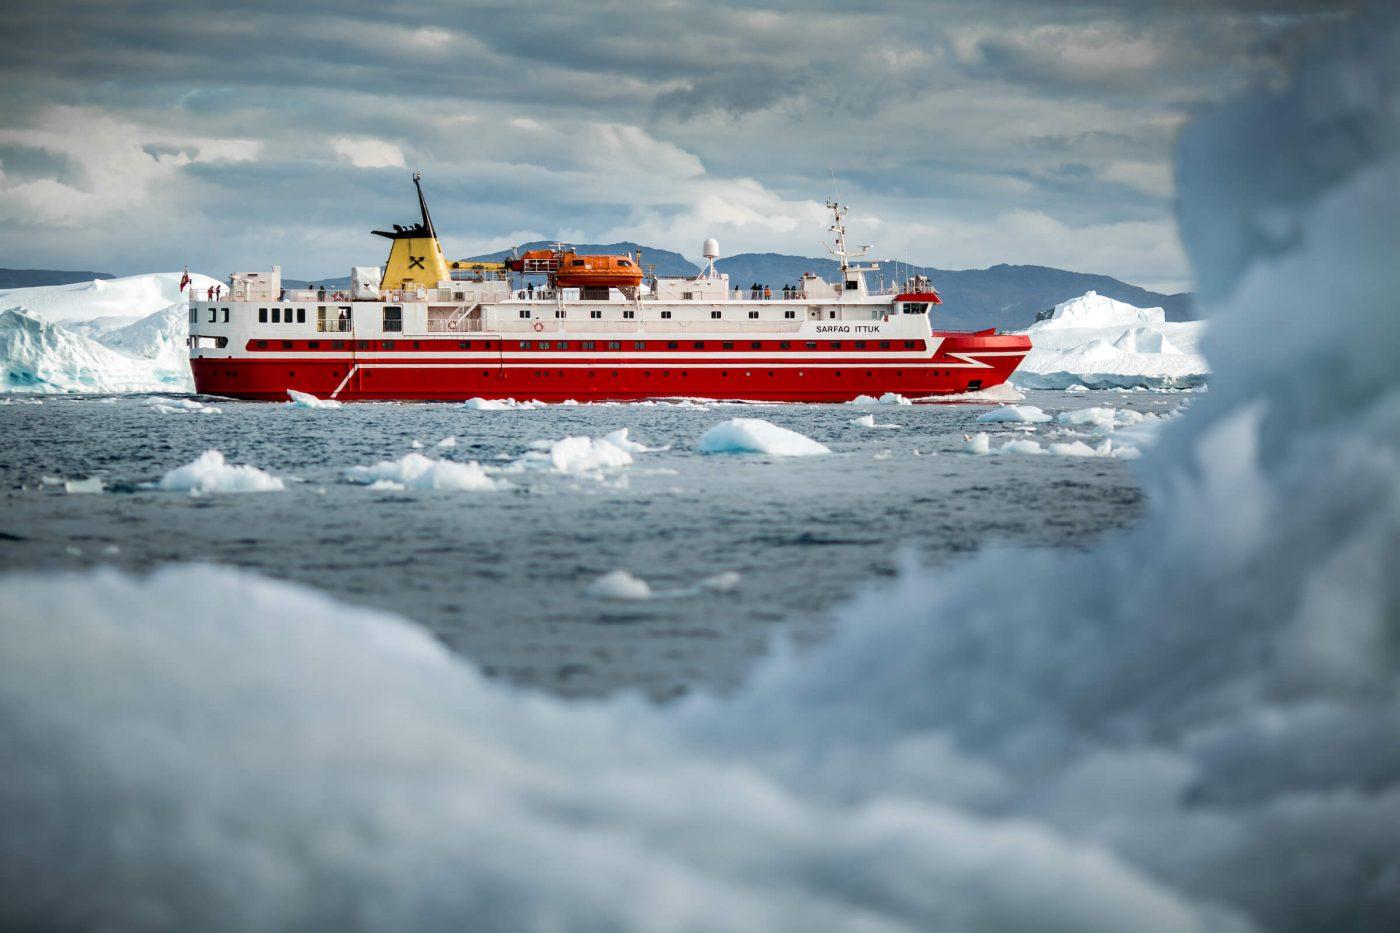 Sarfaq Ittuk cruising in the Disko Bay outside Ilulissat ice fjord in Greenland. Visit Greenland